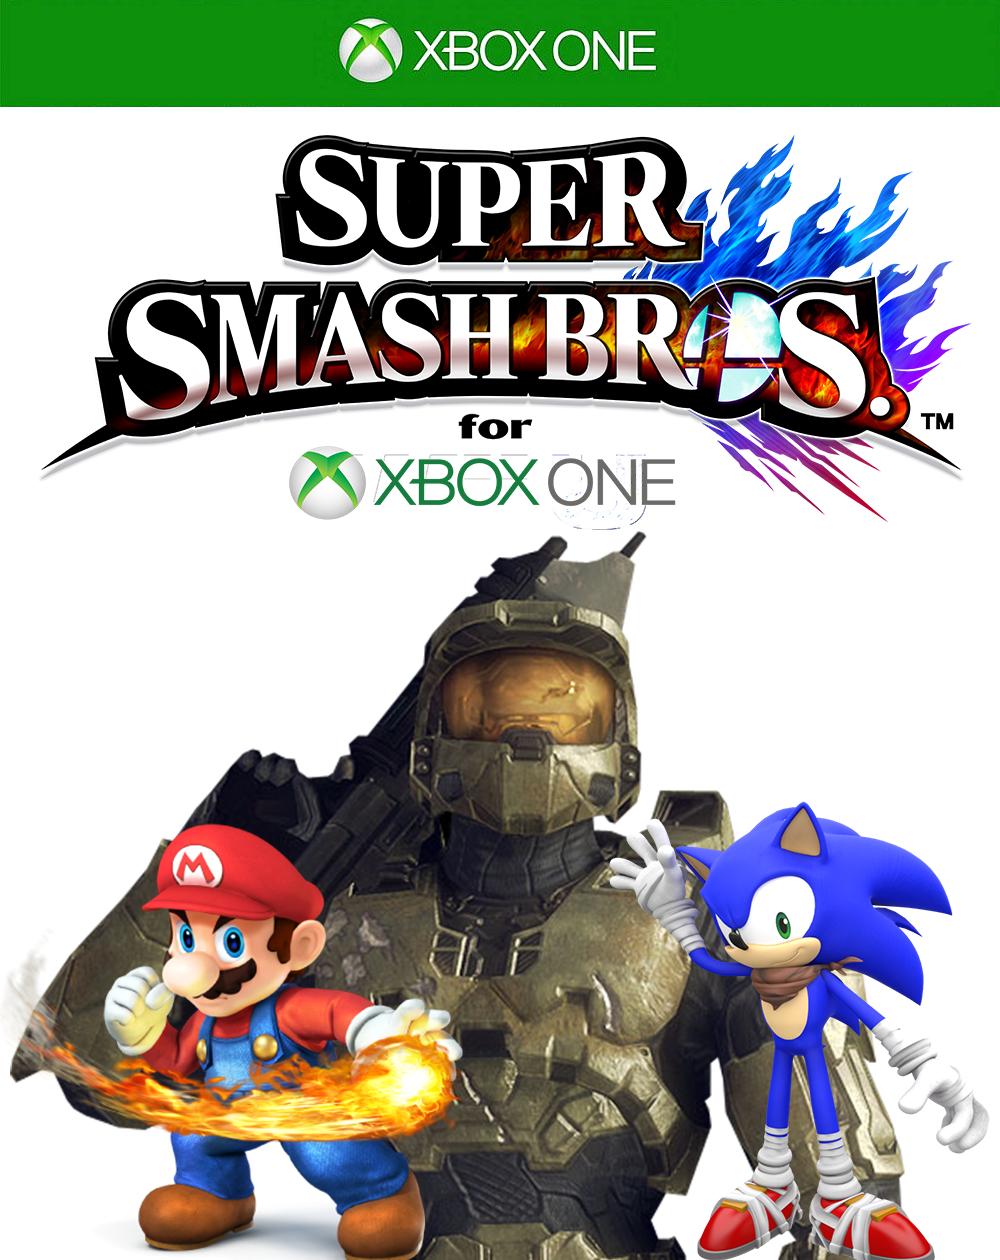 Super Smash Bros For Xbox One Fantendo Nintendo Fanon Wiki - Minecraft spiele fur xbox 360